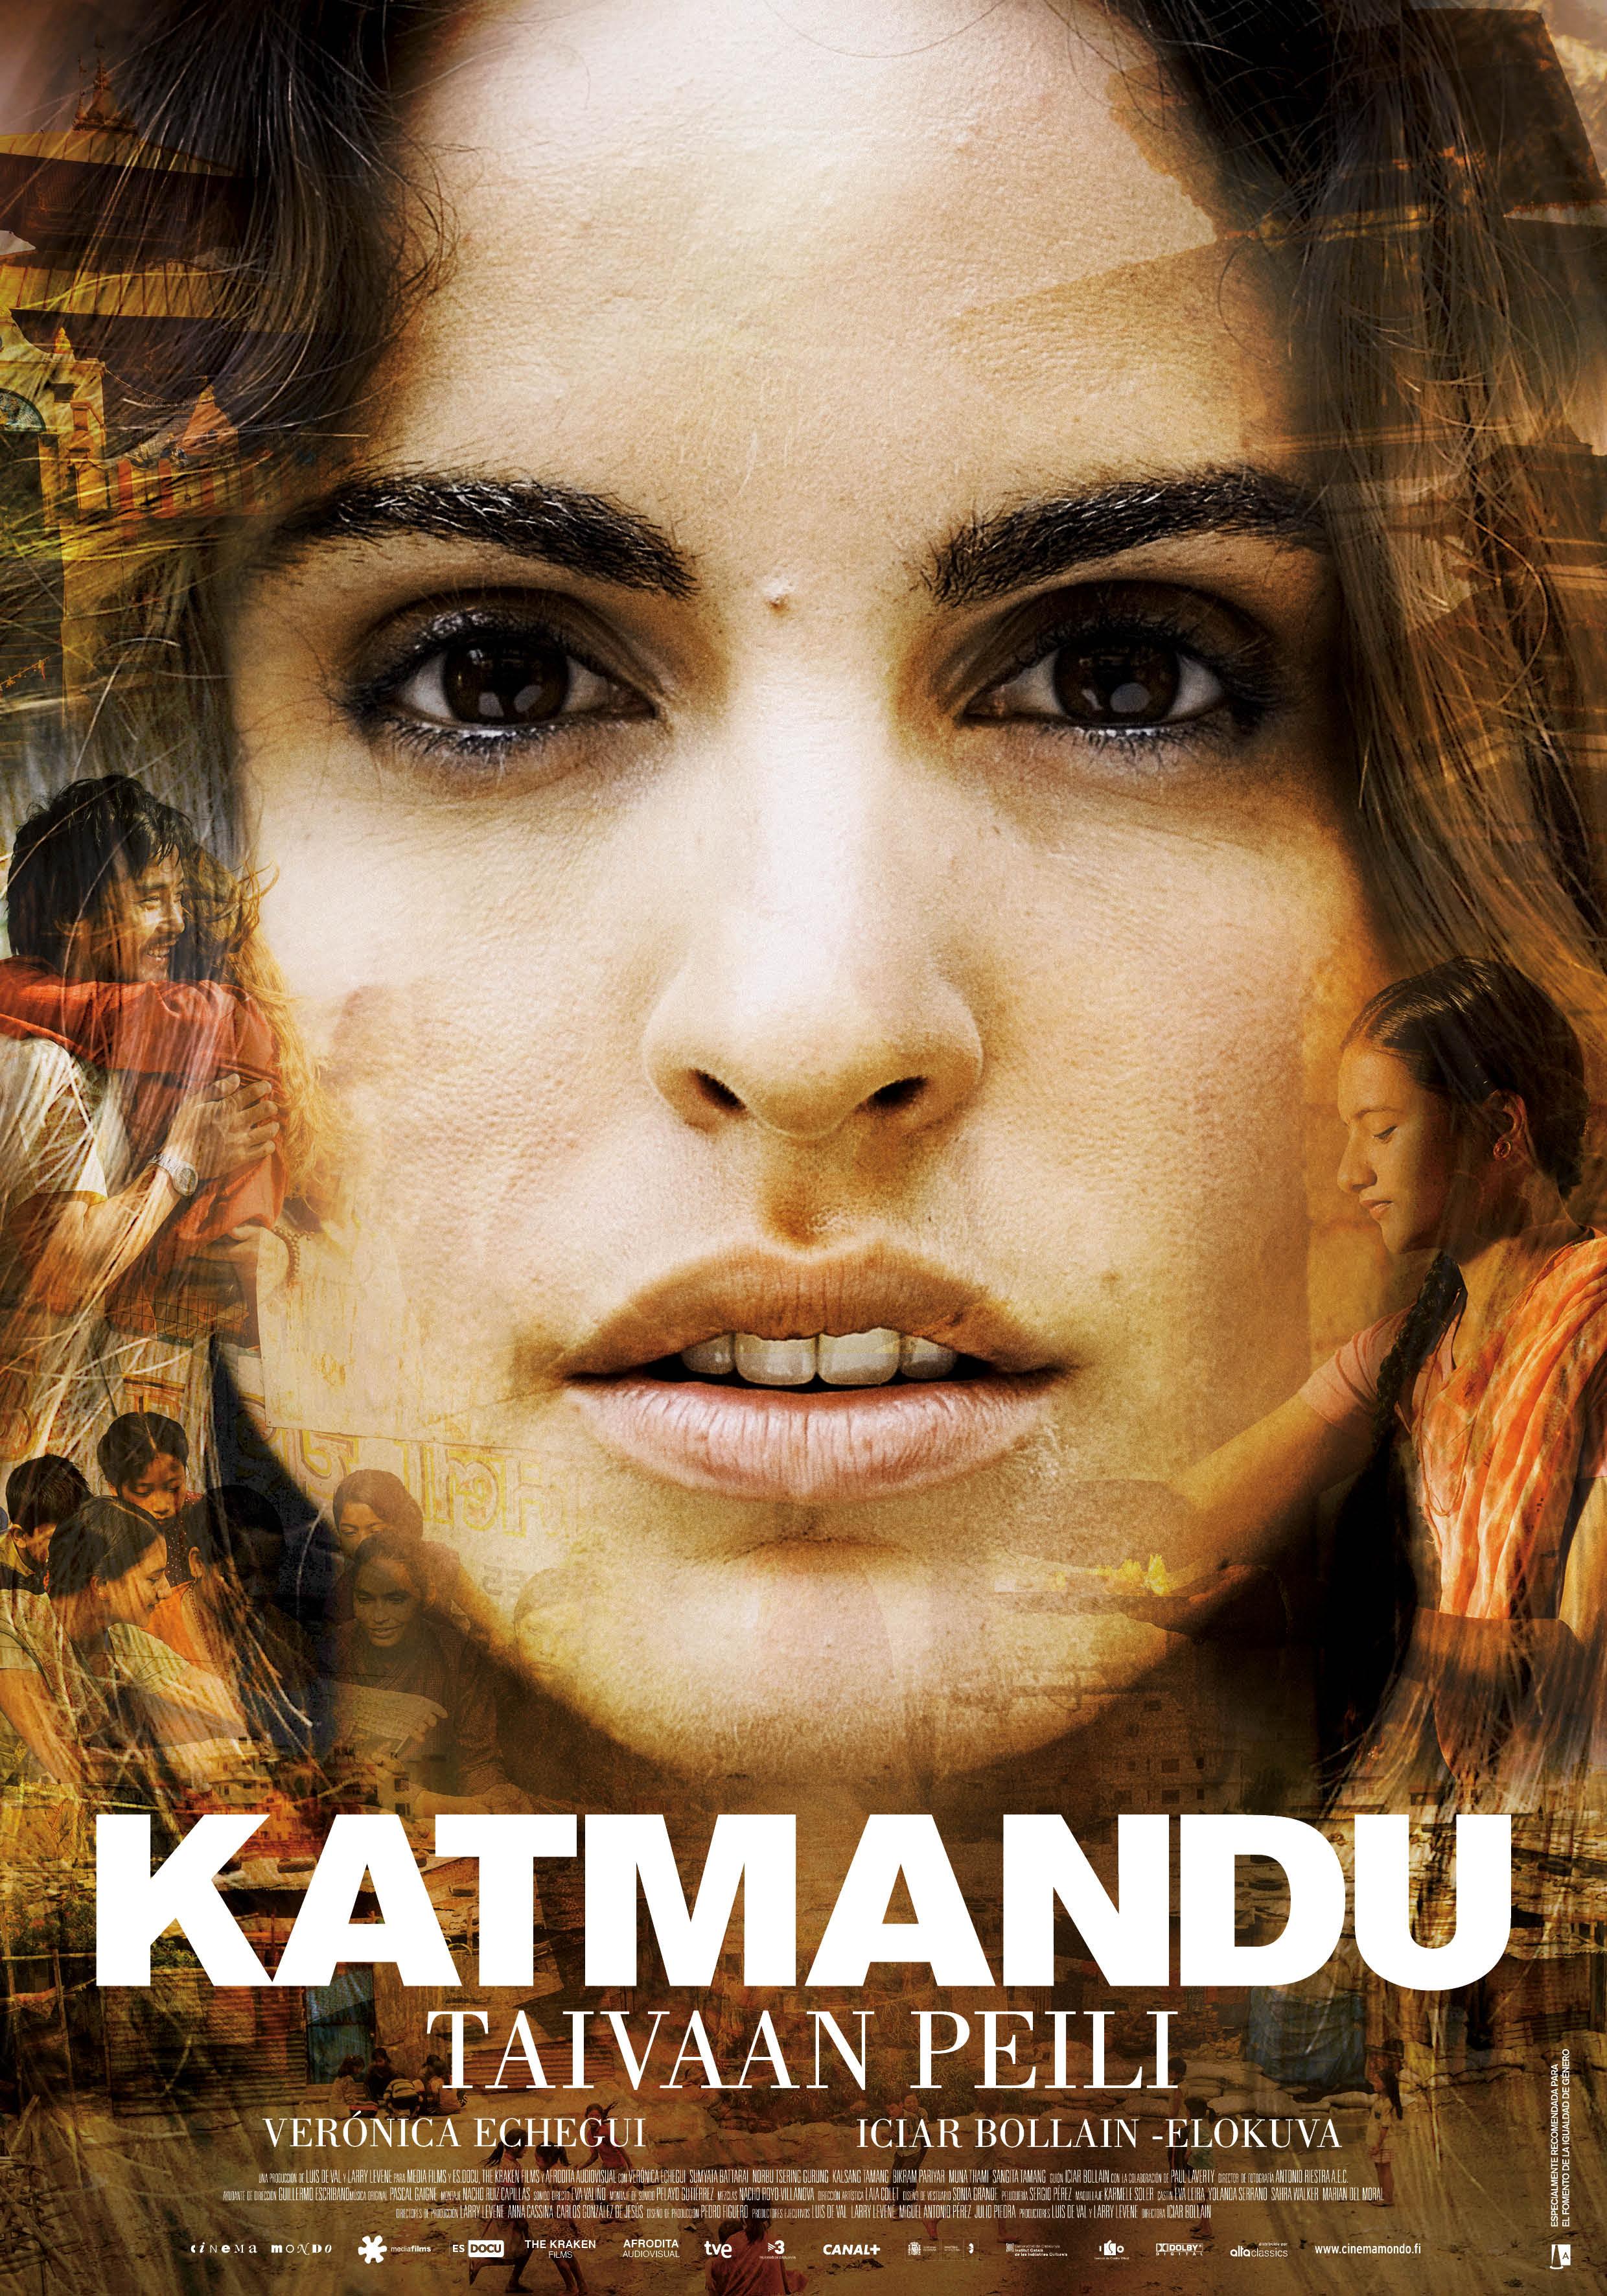 Katmandu – Taivaan peili